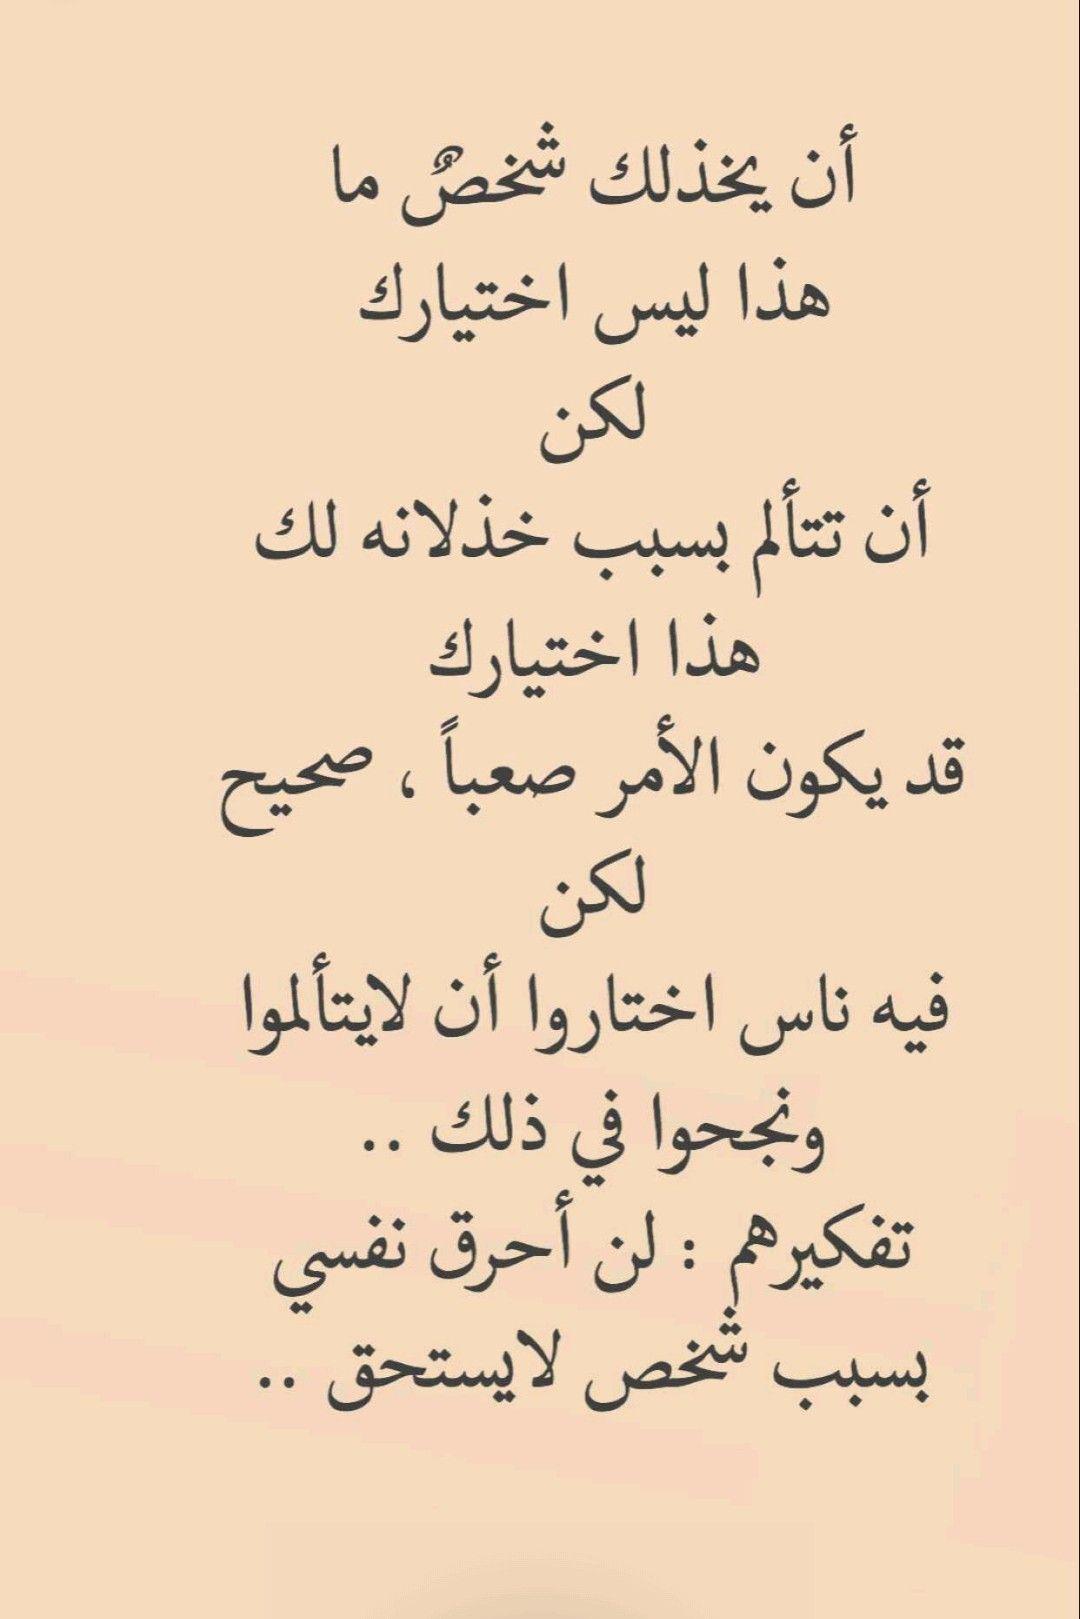 Pin By صقر السماء On كلام أعجبني Arabic Quotes Quotes Math